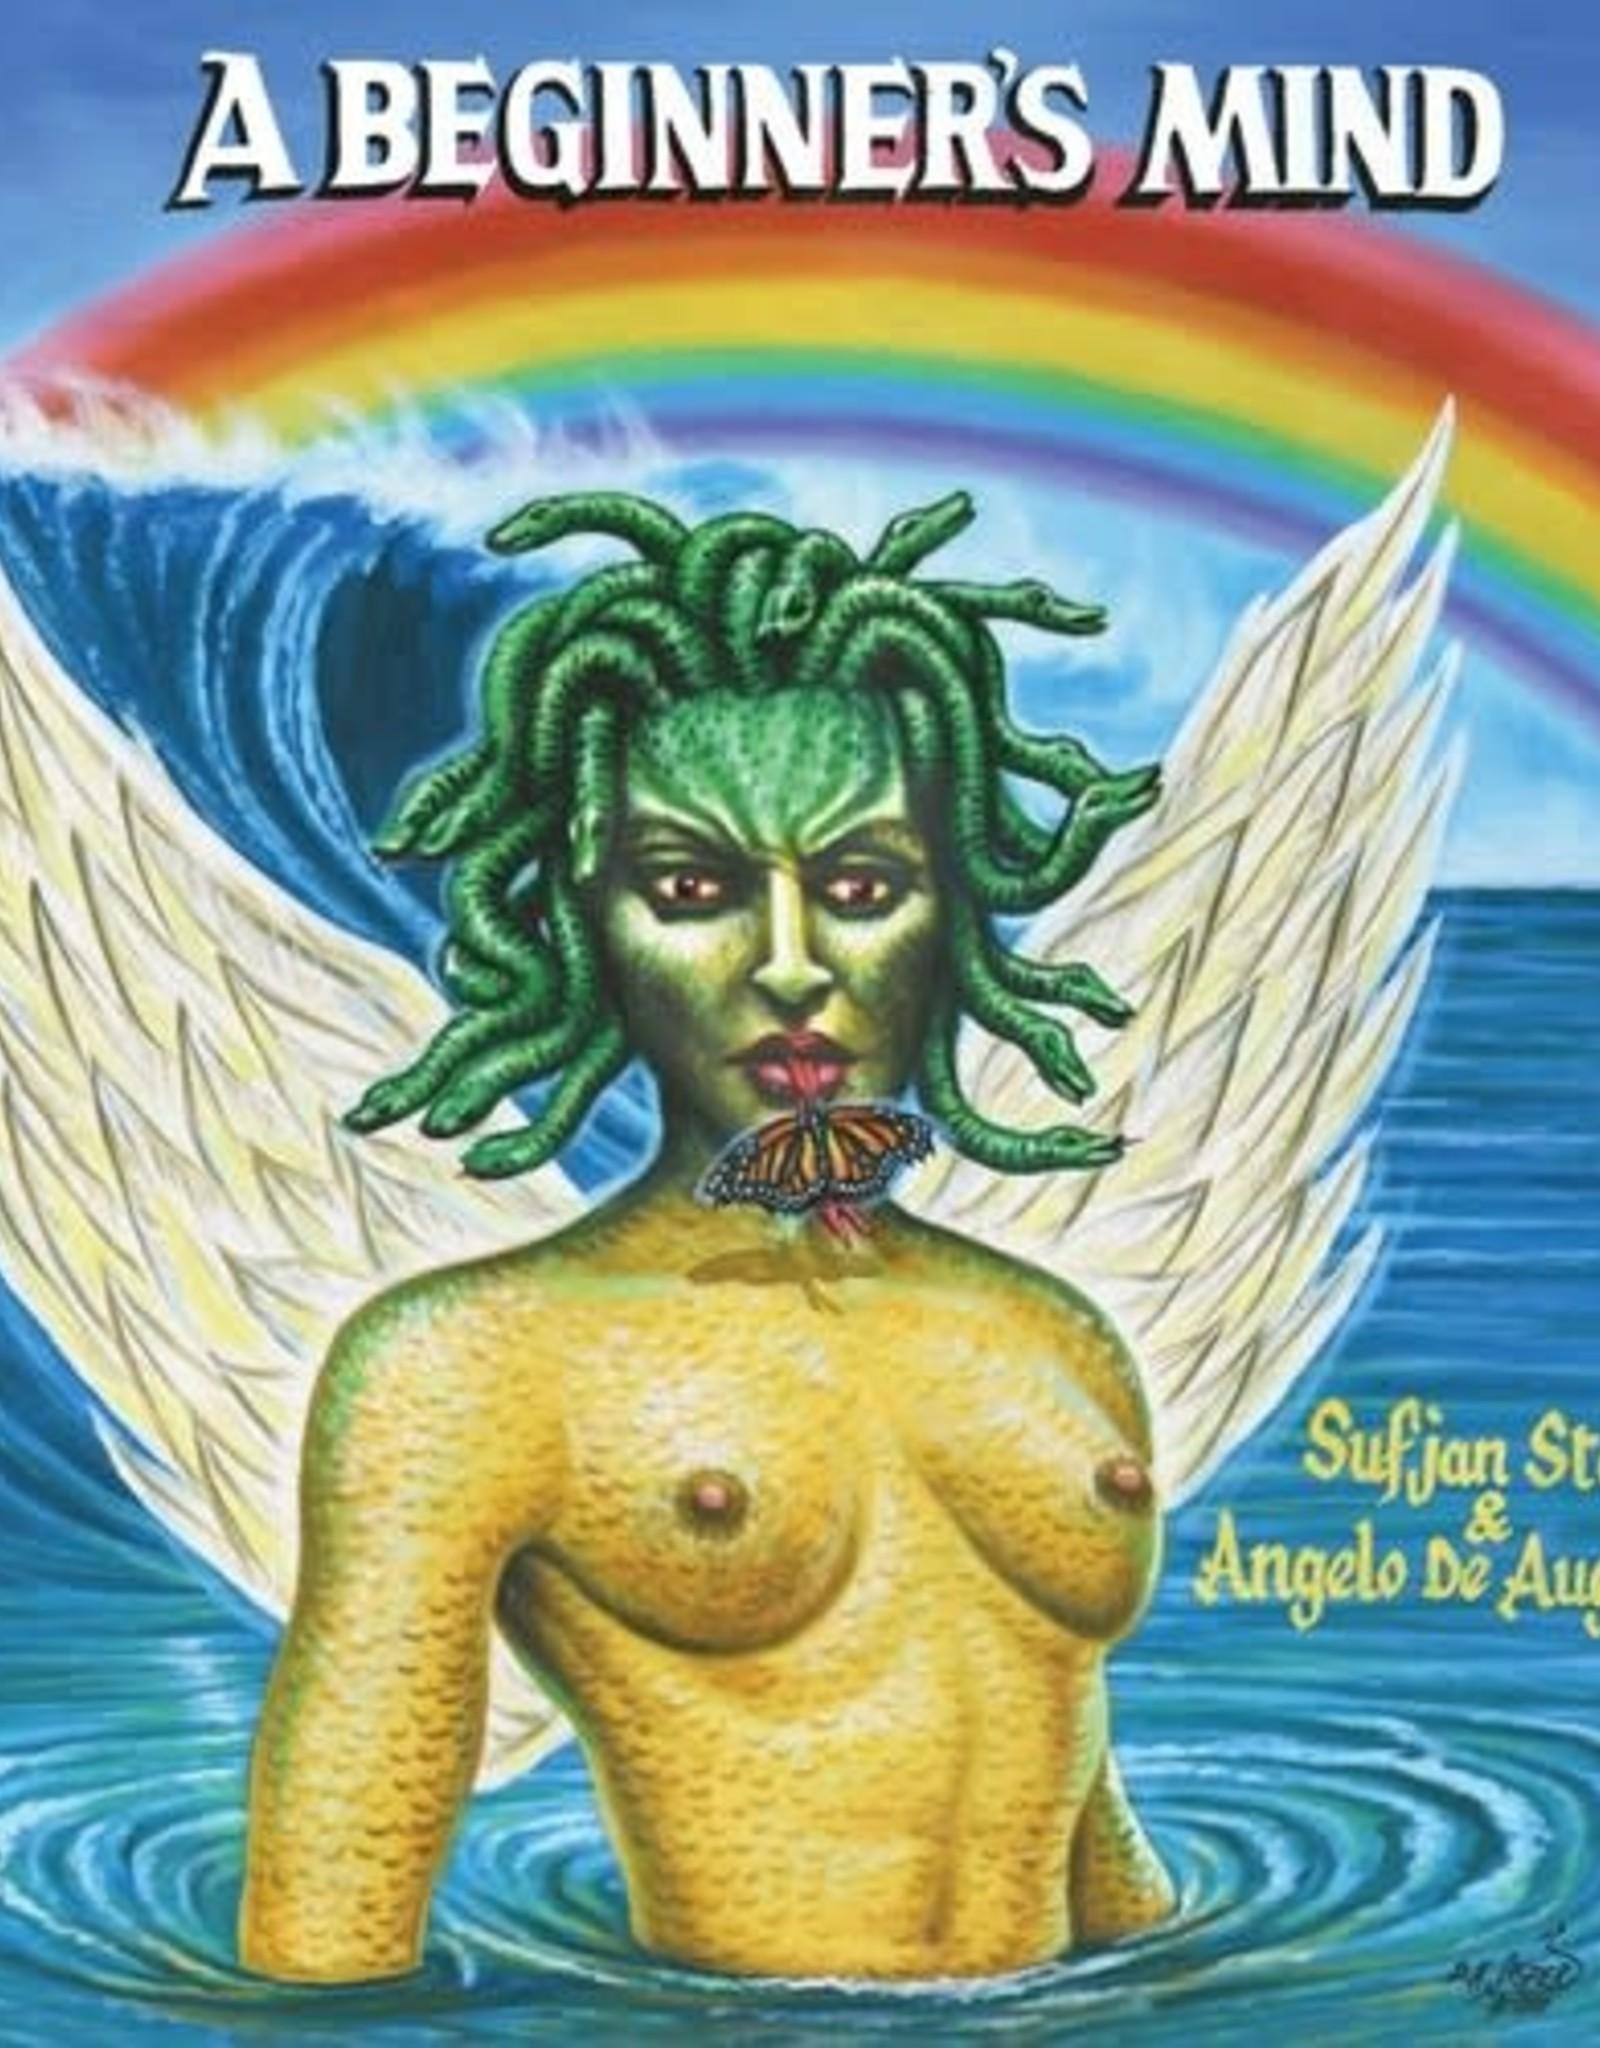 Sufjan Stevens & Angelo De Augustine - A Beginner's Mind (North  America Exclusive)(Olympus Perseus Shield Gold Vinyl LP)